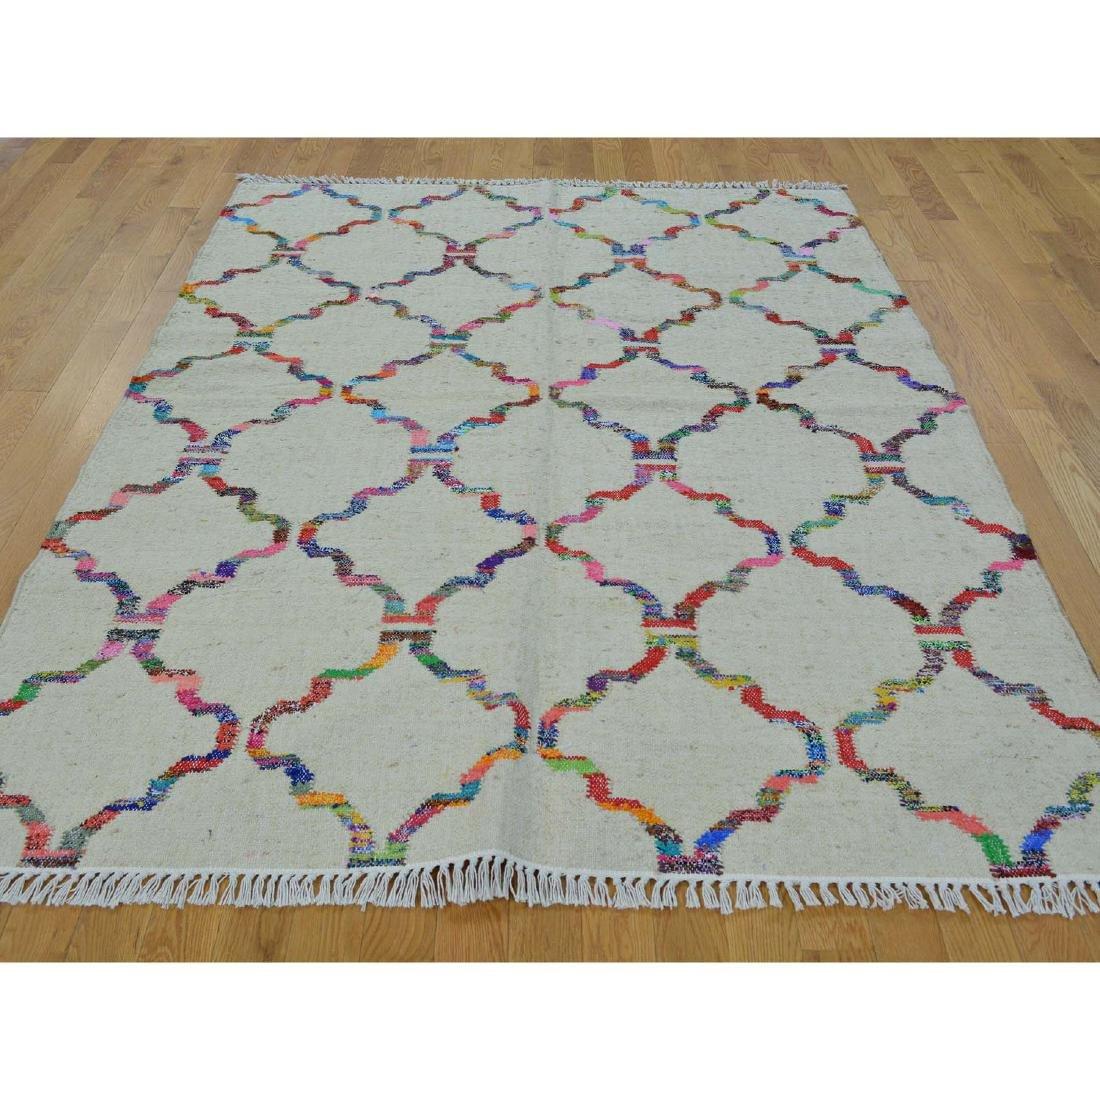 Durie Kilim Wool & Sari Silk Hand Woven Rug 5.2x7.1 - 2